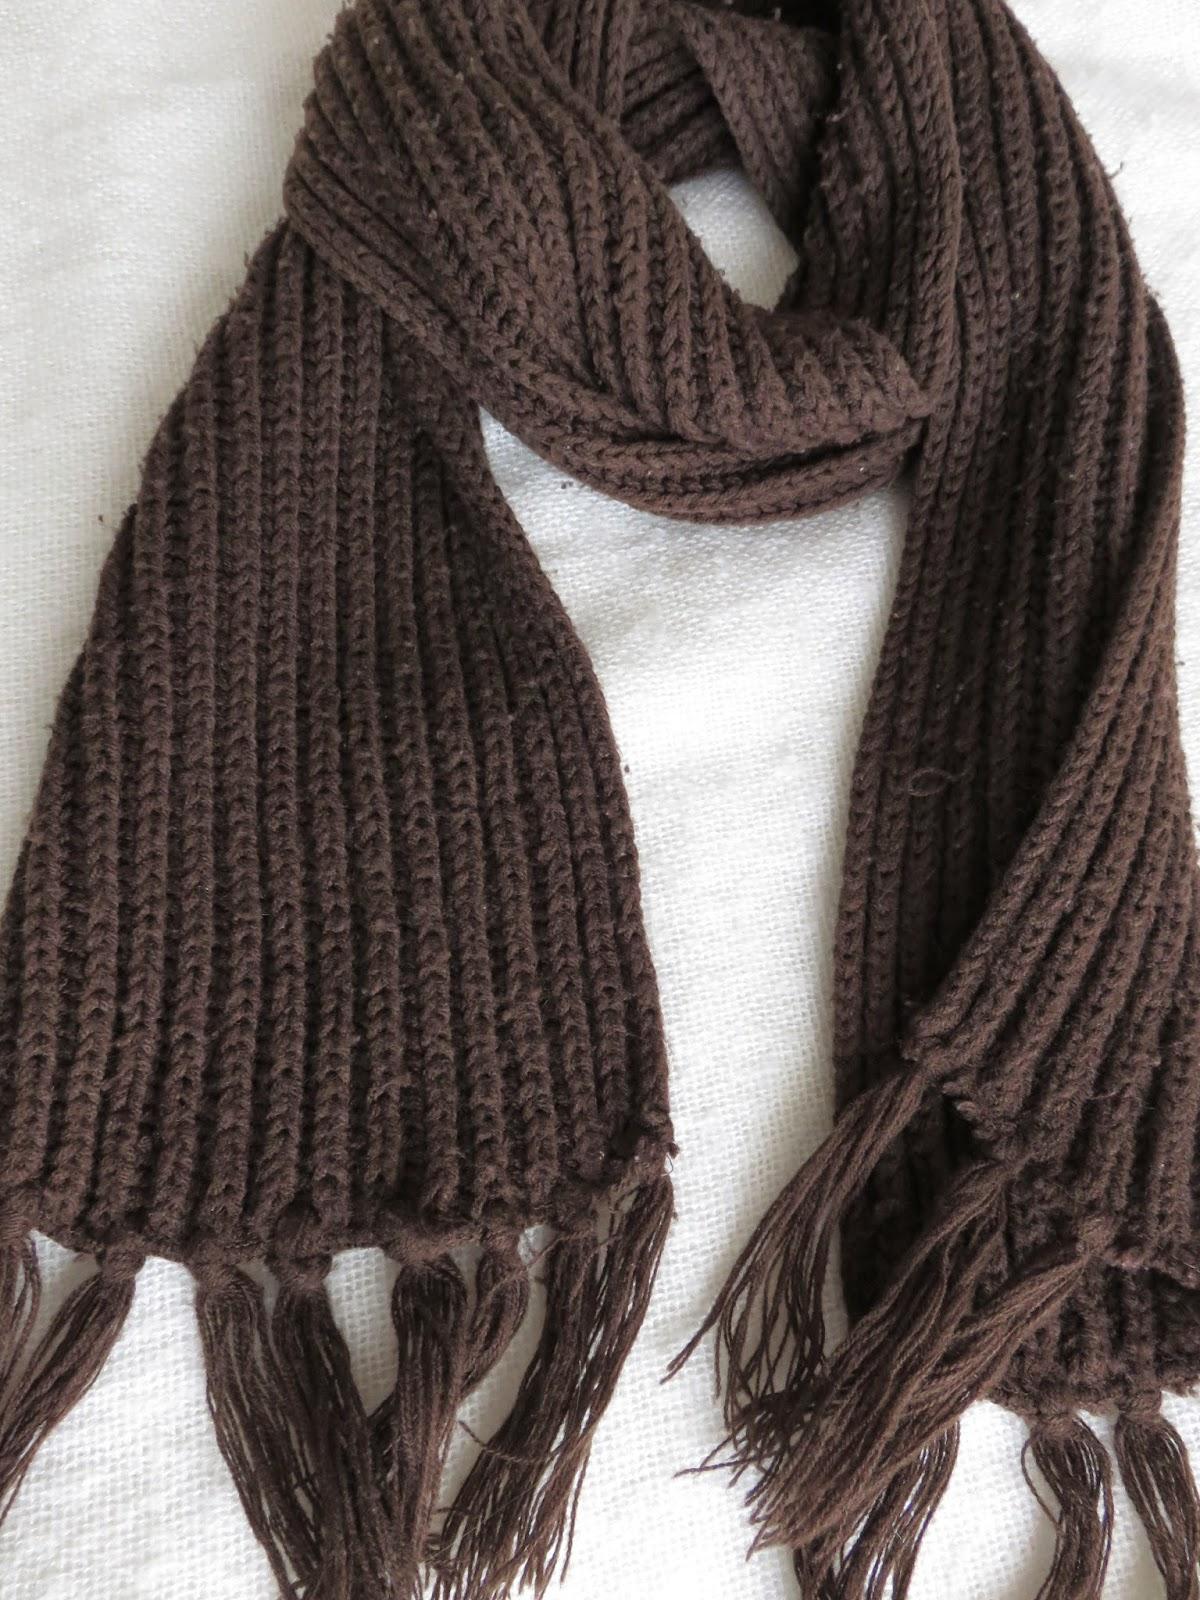 bruine dikke sjaal brown thick knit scarf